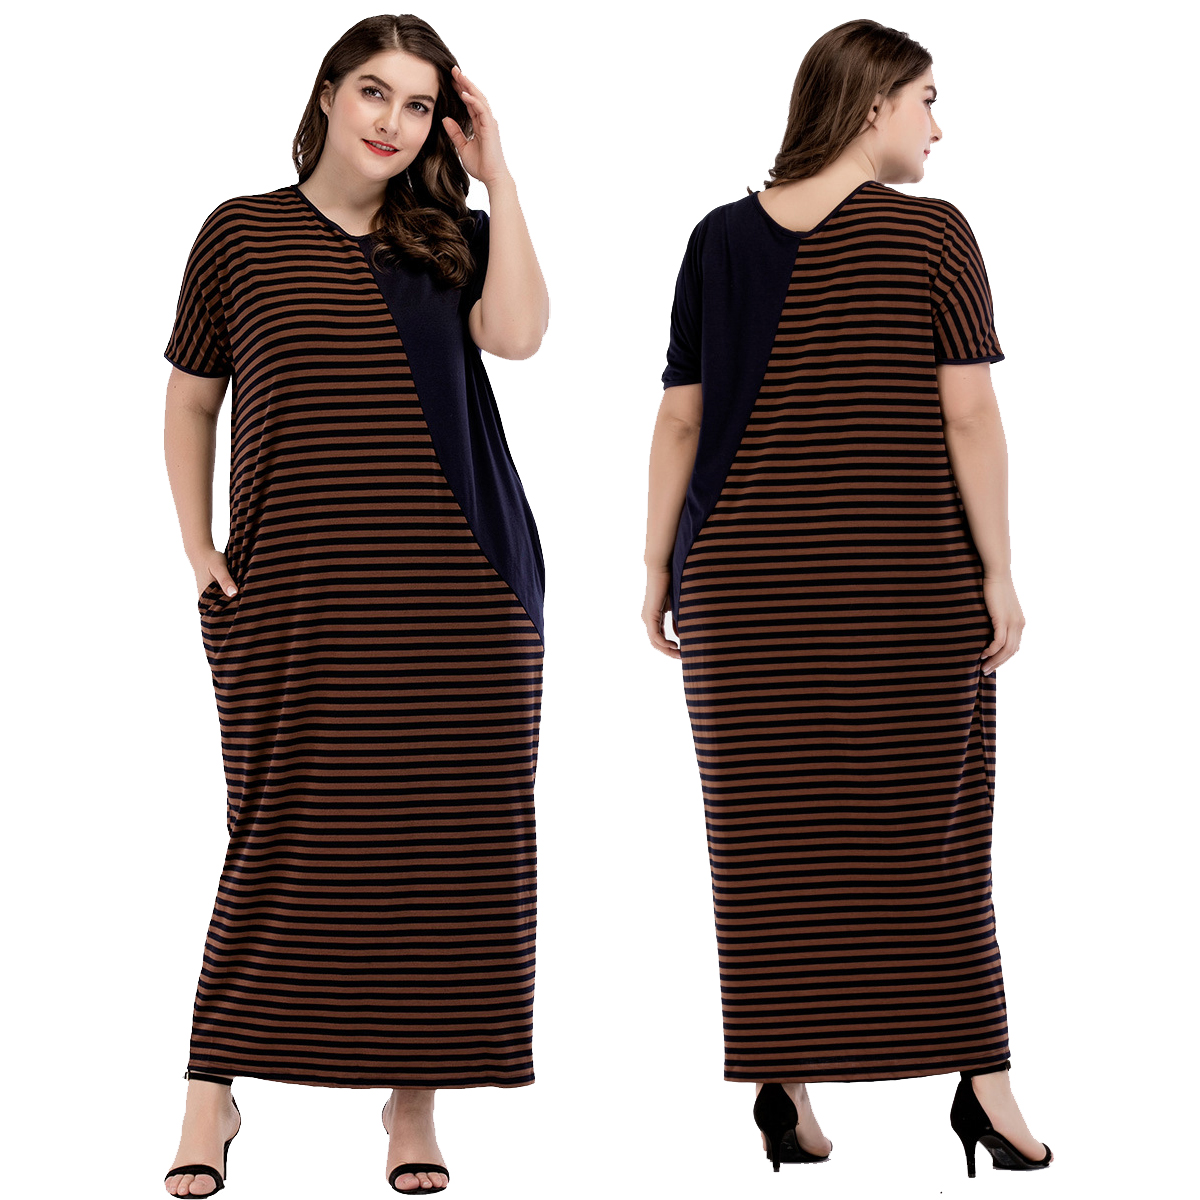 9ee9aa02d7 Details about Women Long Robe Stripe Maxi Dress Casual Muslim Abaya  Moroccan Kaftan Islam Arab